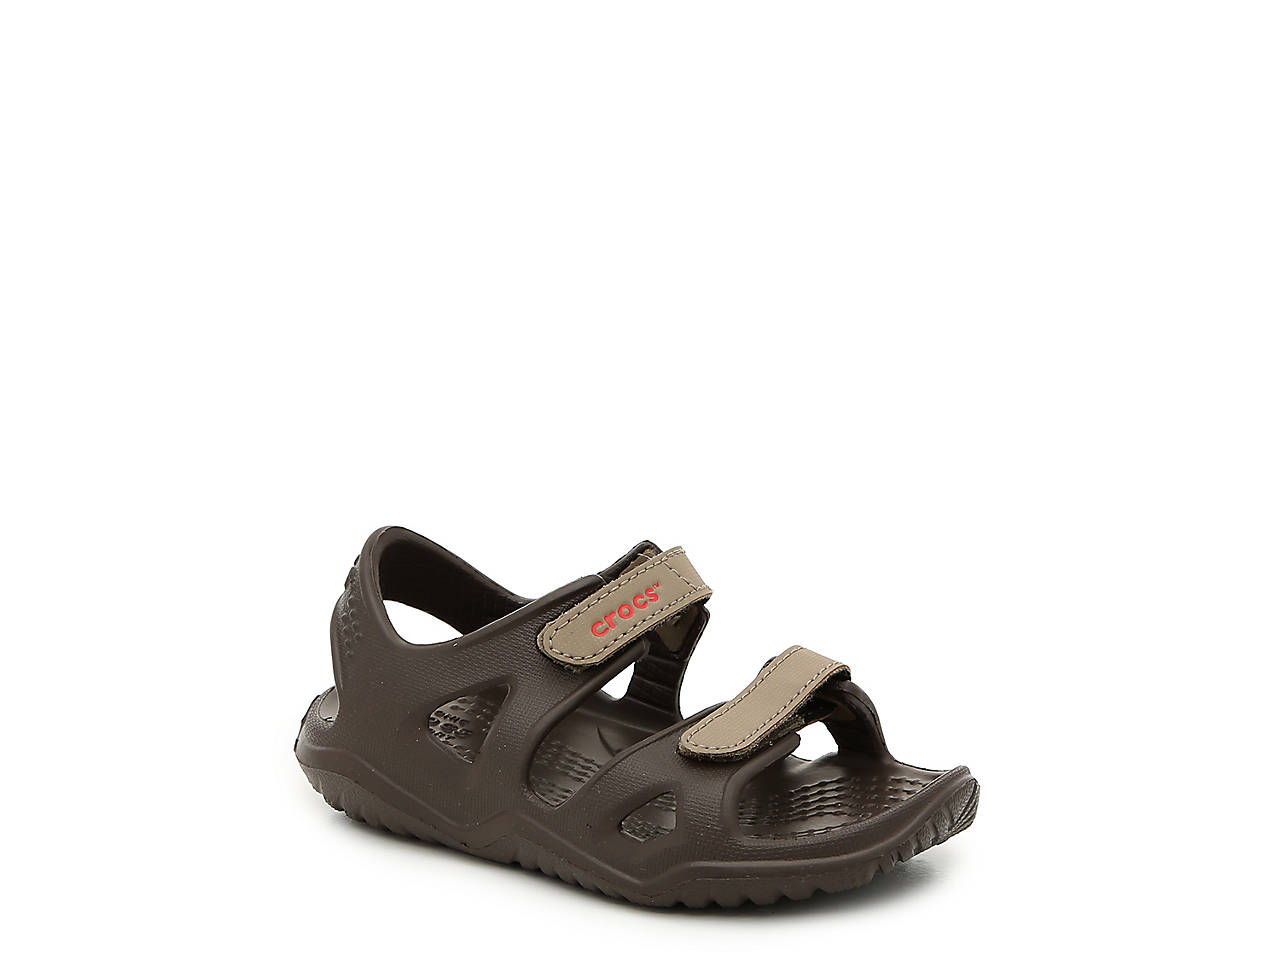 2b24349b7f4b Crocs Swiftwater Toddler   Youth Sandal Kids Shoes